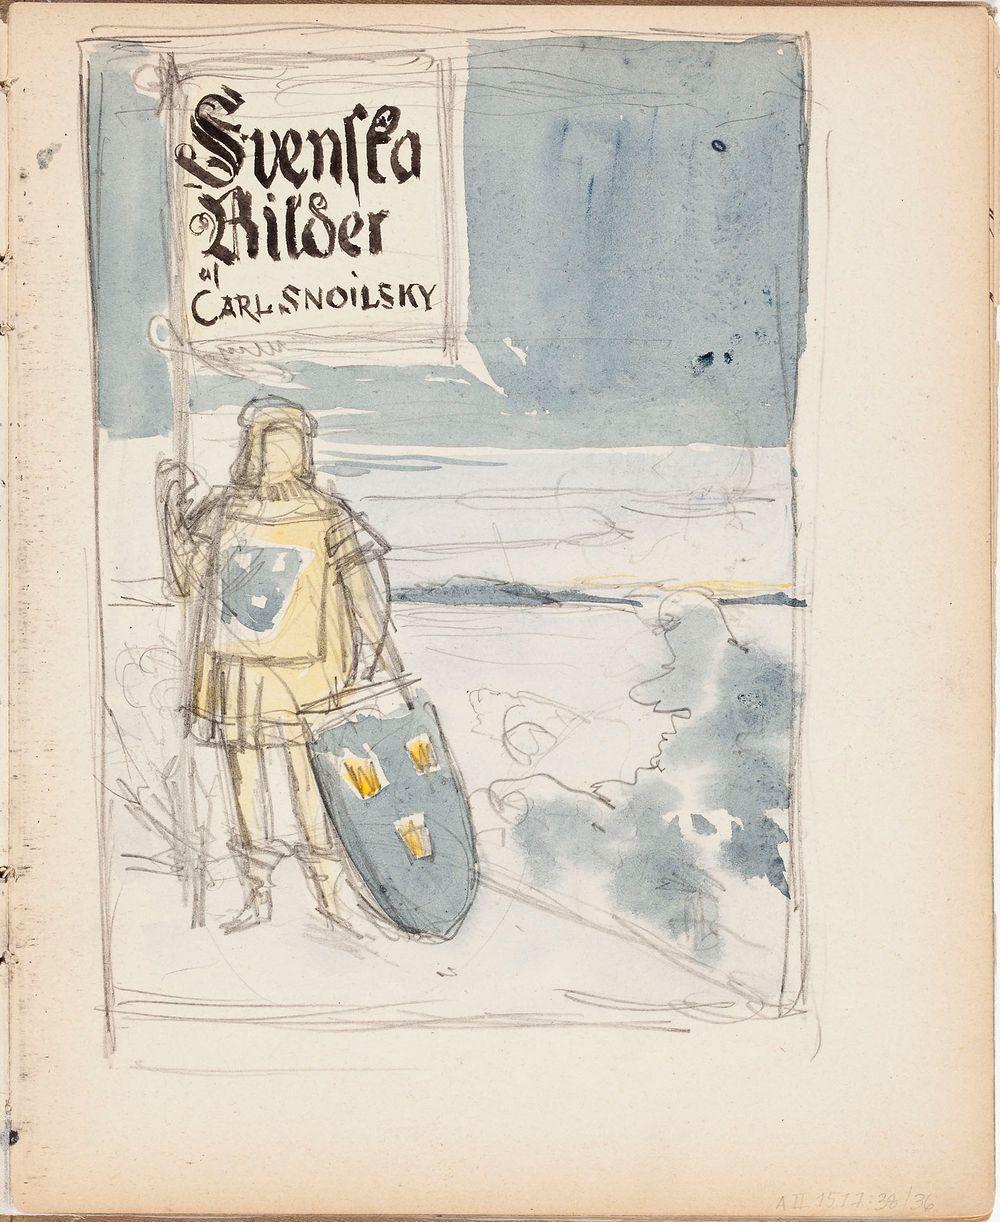 Luonnos Carl Snoilsky, Svenska bilder -teoksen kansikuvaksi